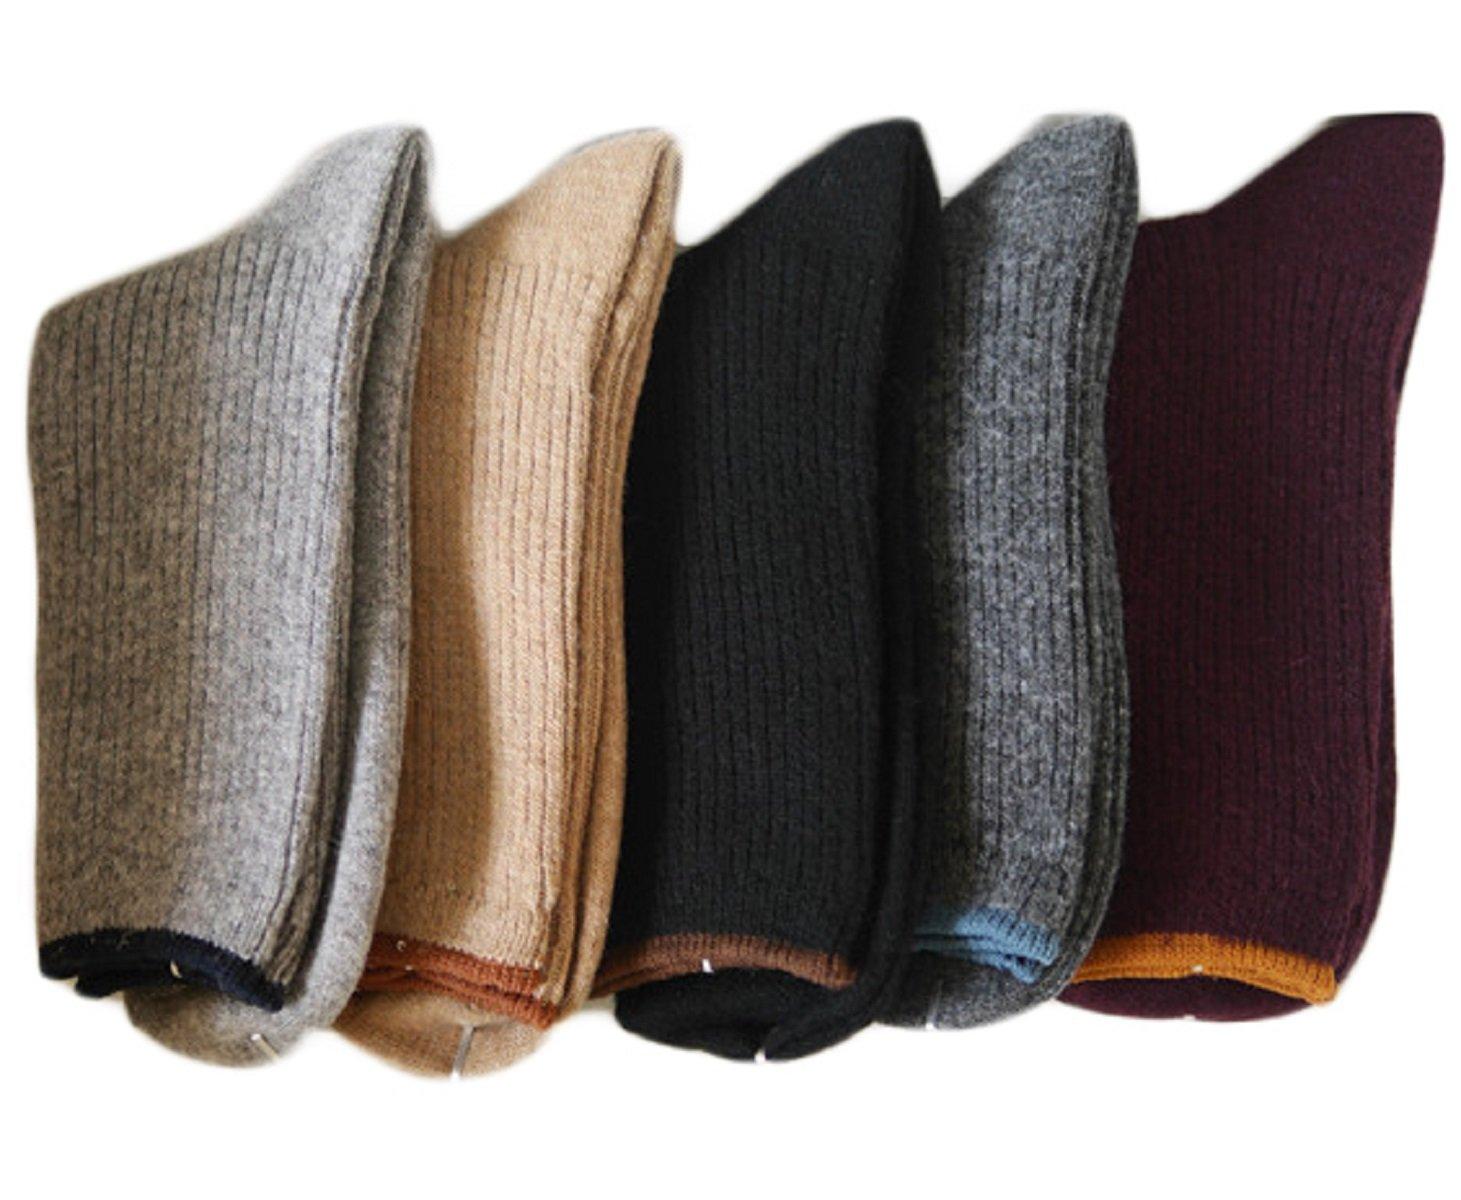 Lovely Annie Women's 3 Pairs Wool Blend Crew Socks HR1612 Casual Solid Size 6-9 (Black, Dark Grey, Wine)